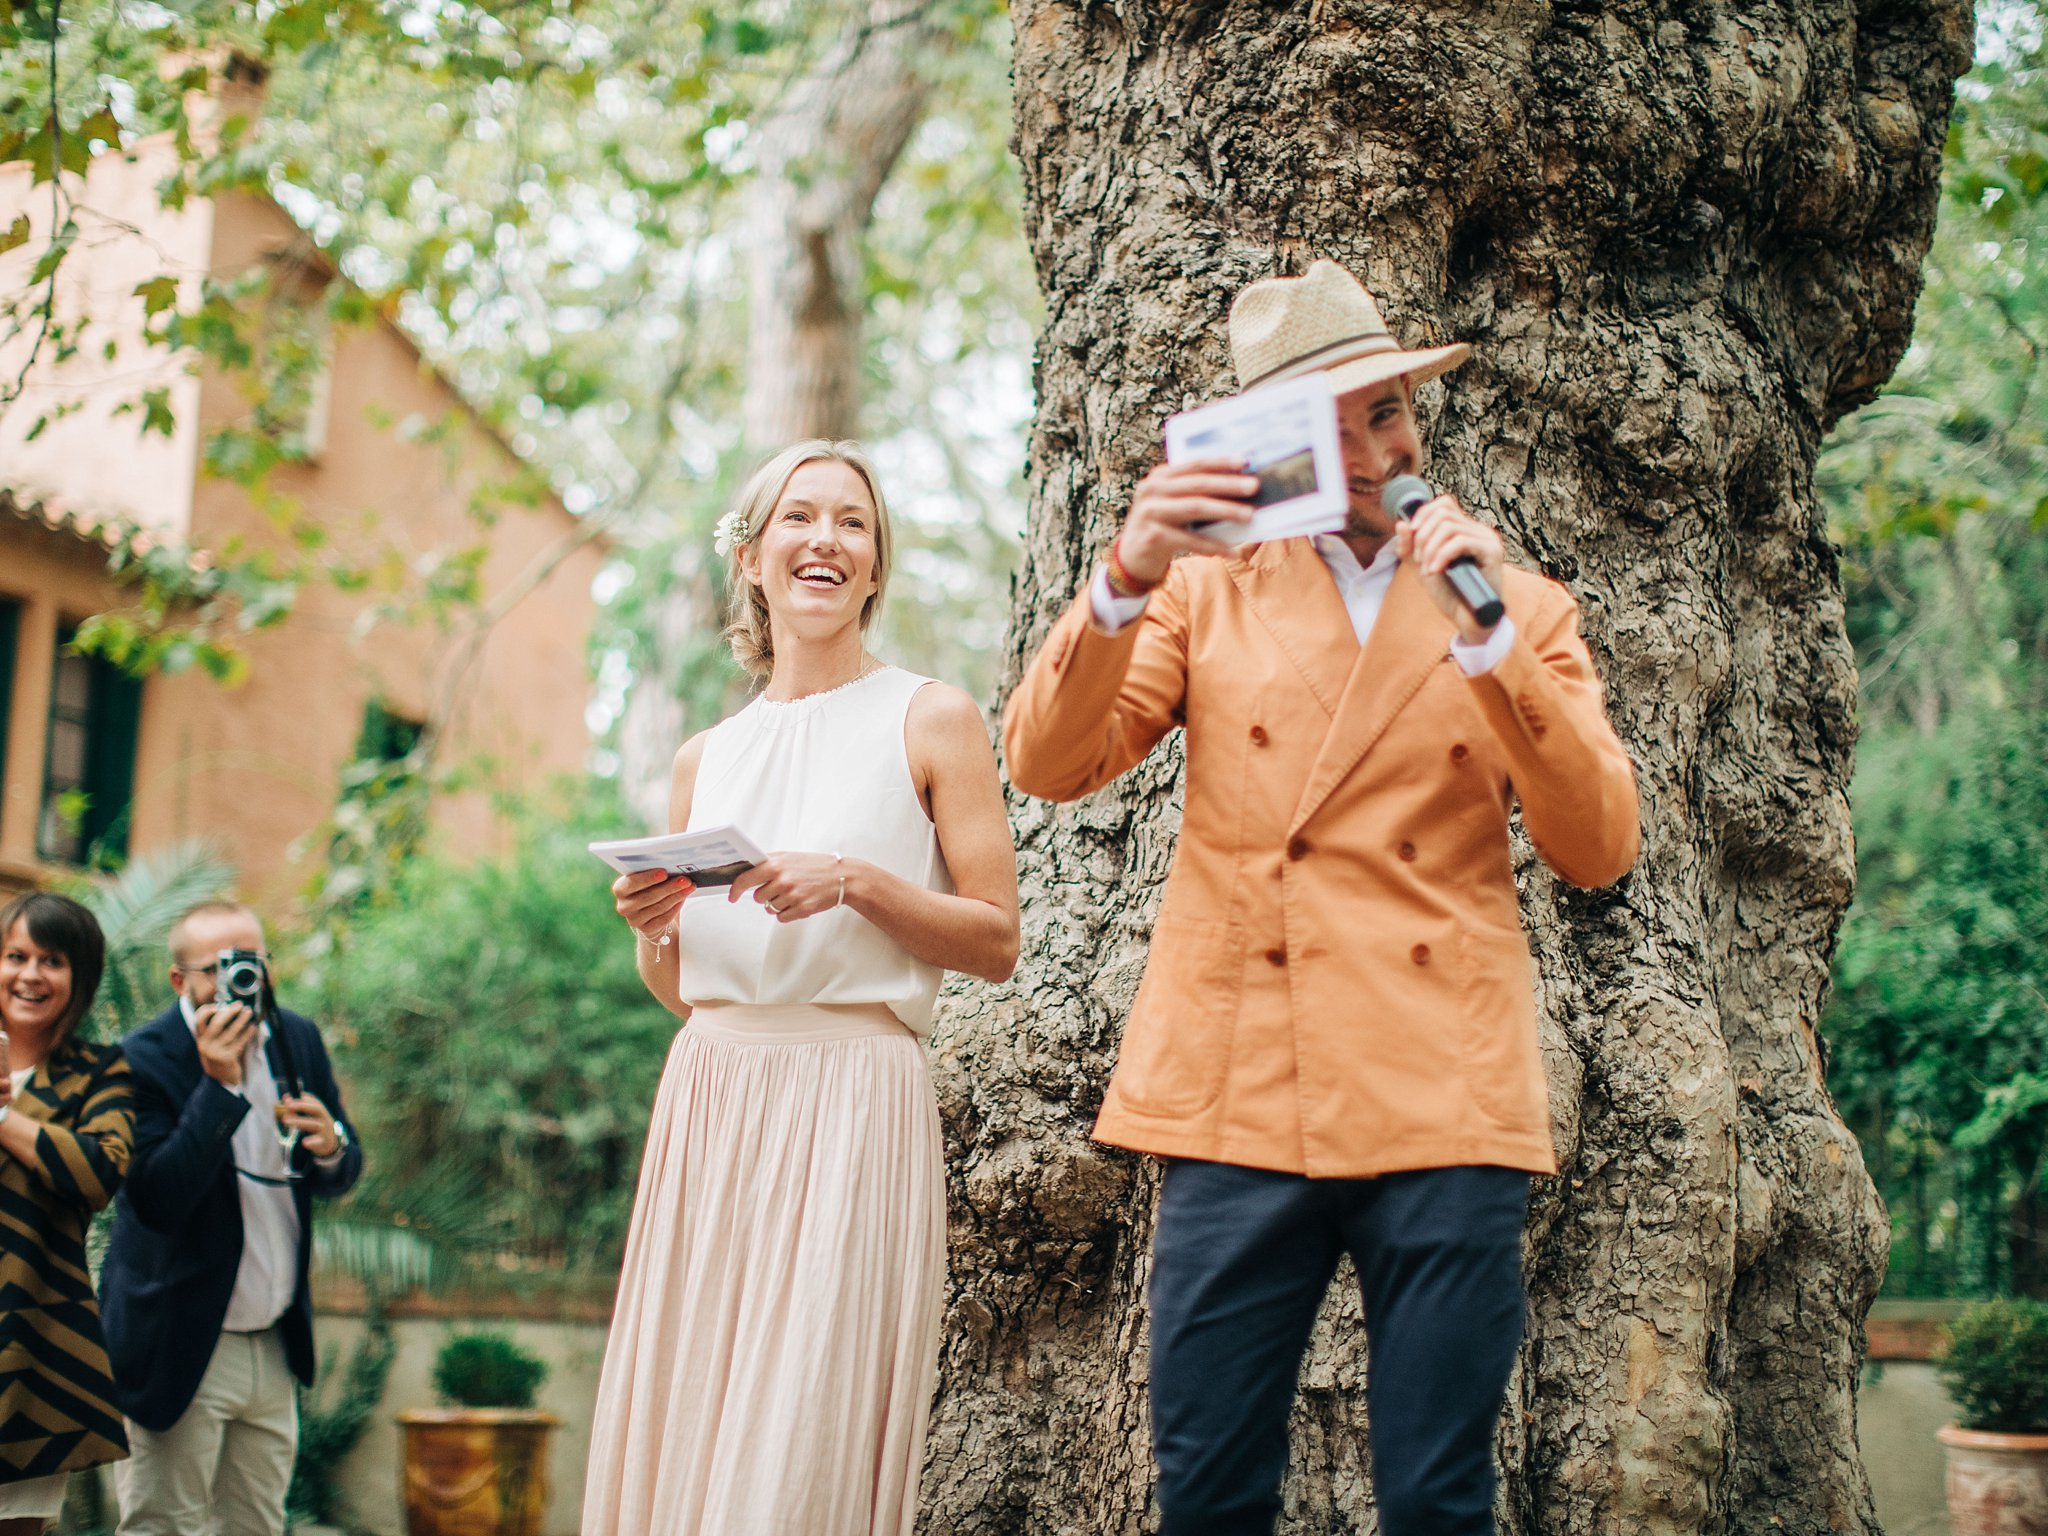 Wedding Photographer Perpignan - Château Las Collas Wedding - Hugo Hennequin075.jpg